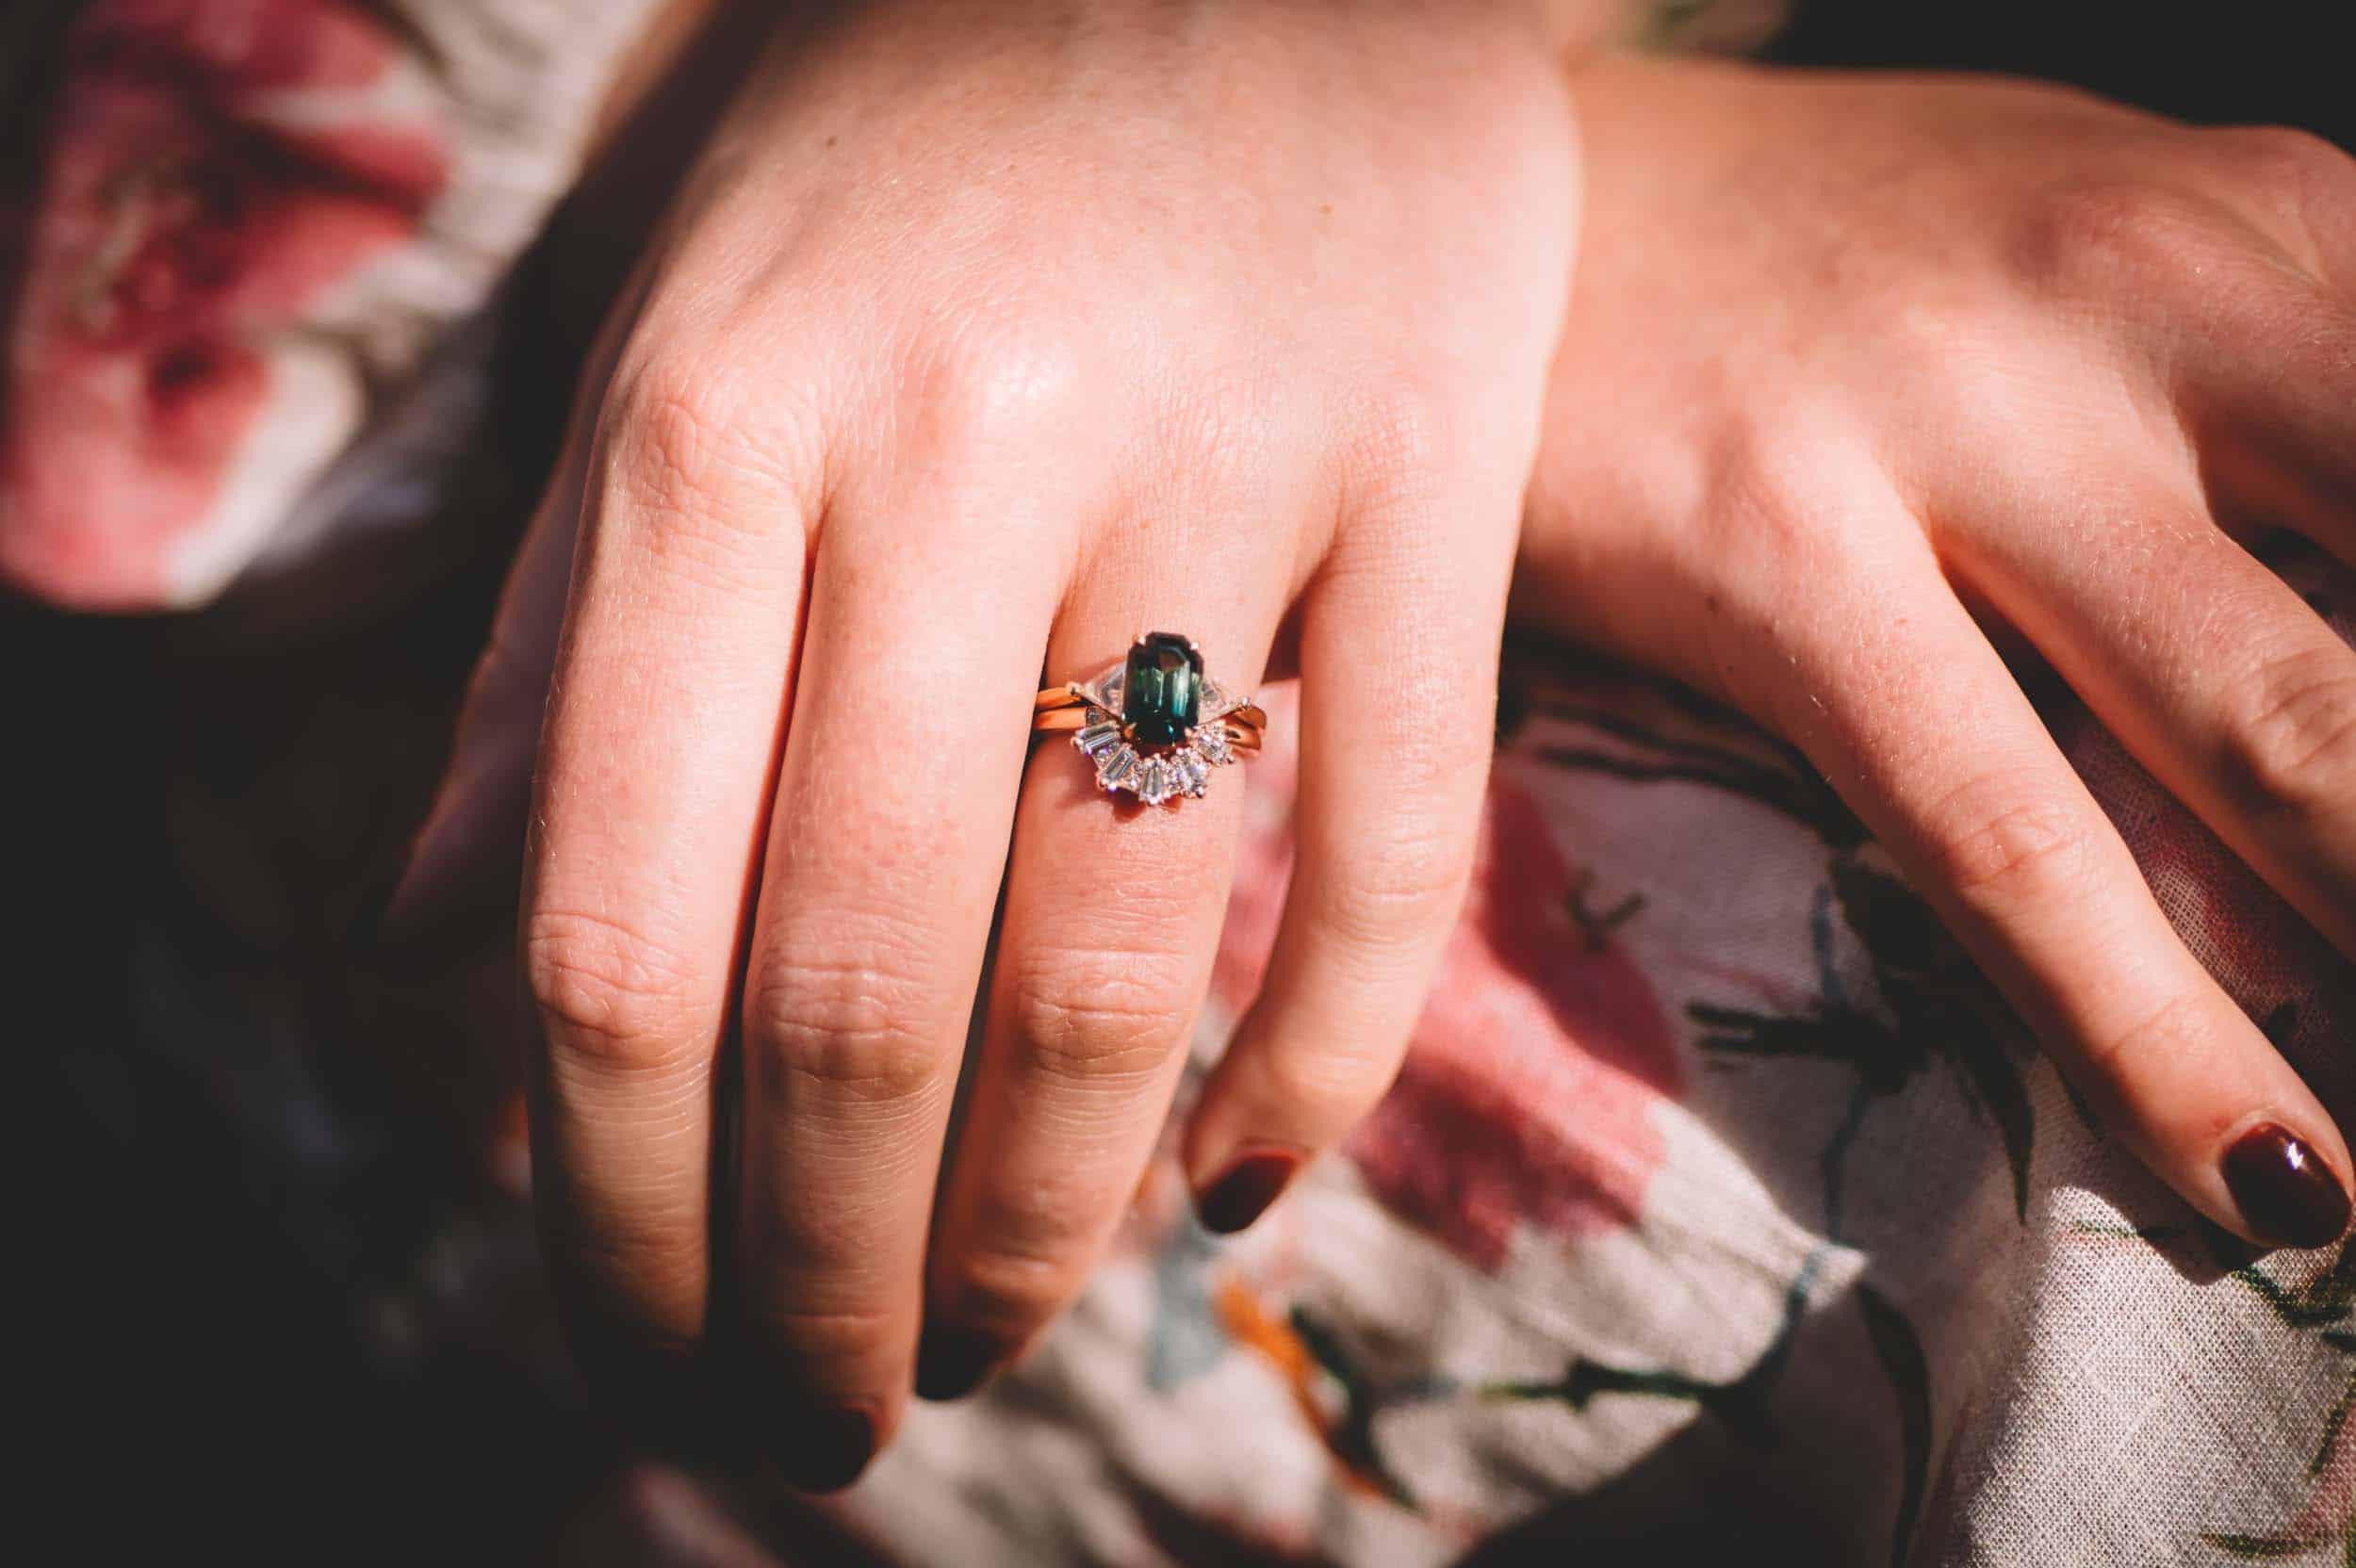 Nick & Nina's Thurlby Domain Elopement wedding ring